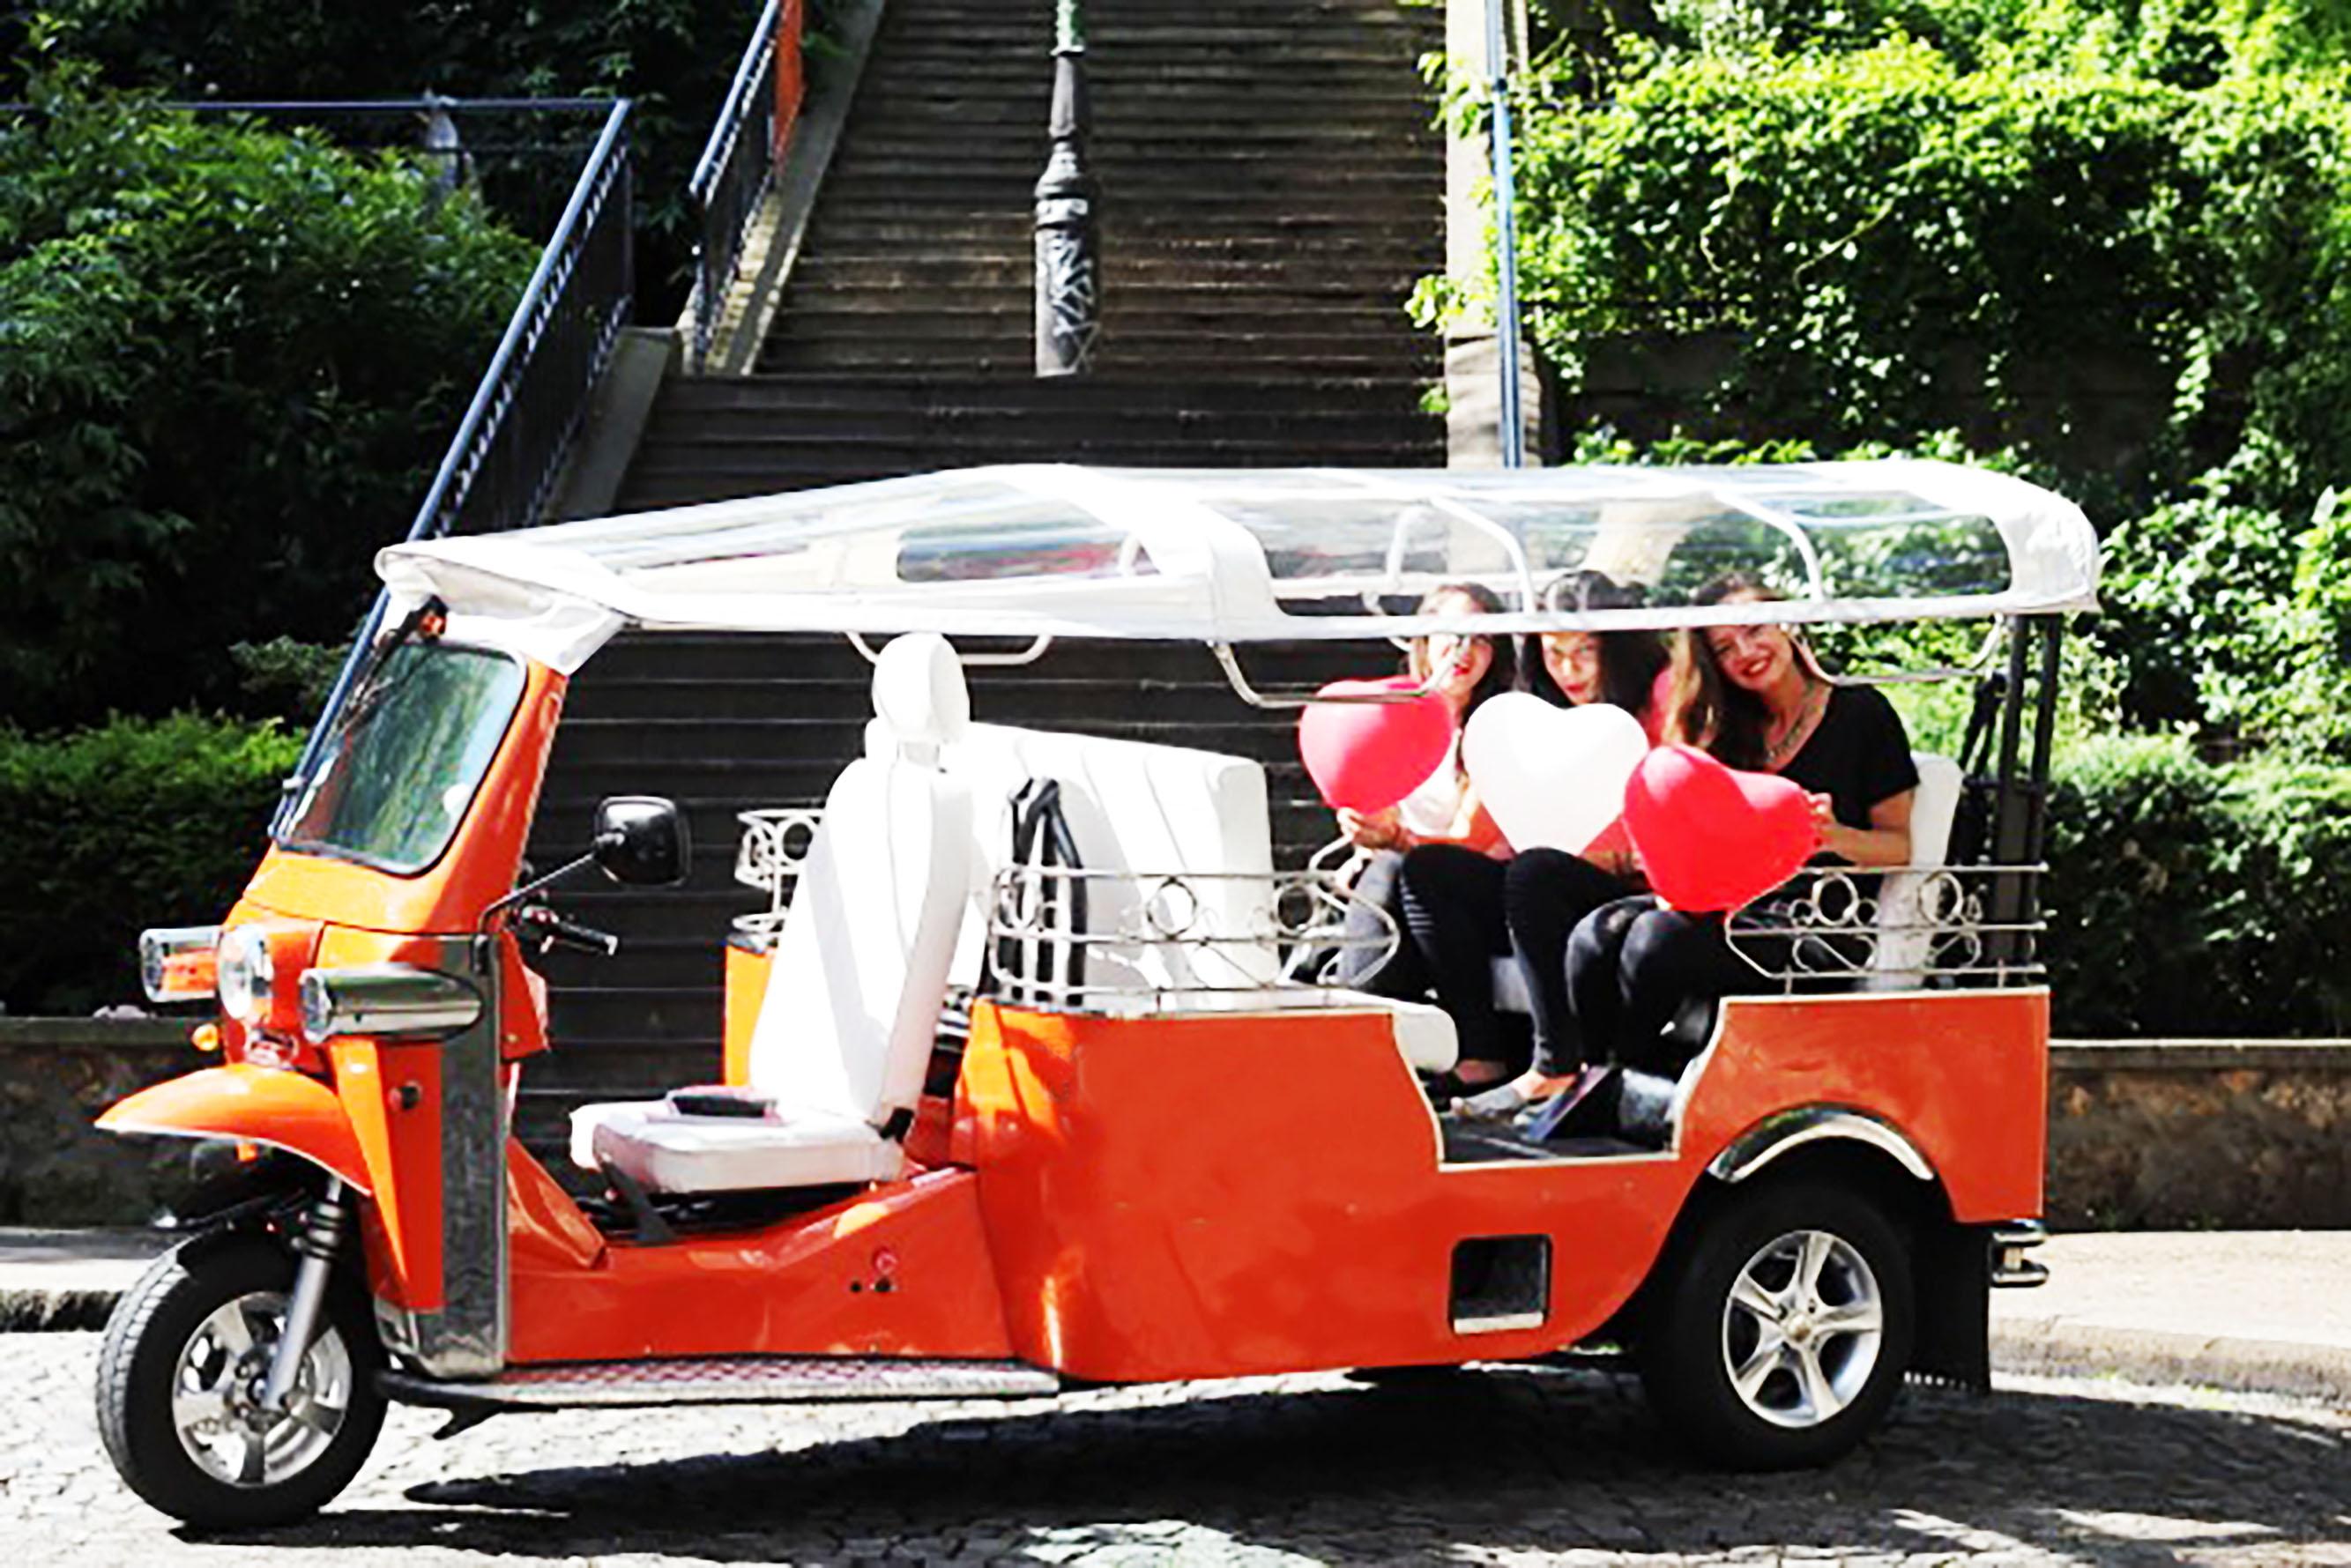 tuktuk ride paris location de v hicule paris 75. Black Bedroom Furniture Sets. Home Design Ideas